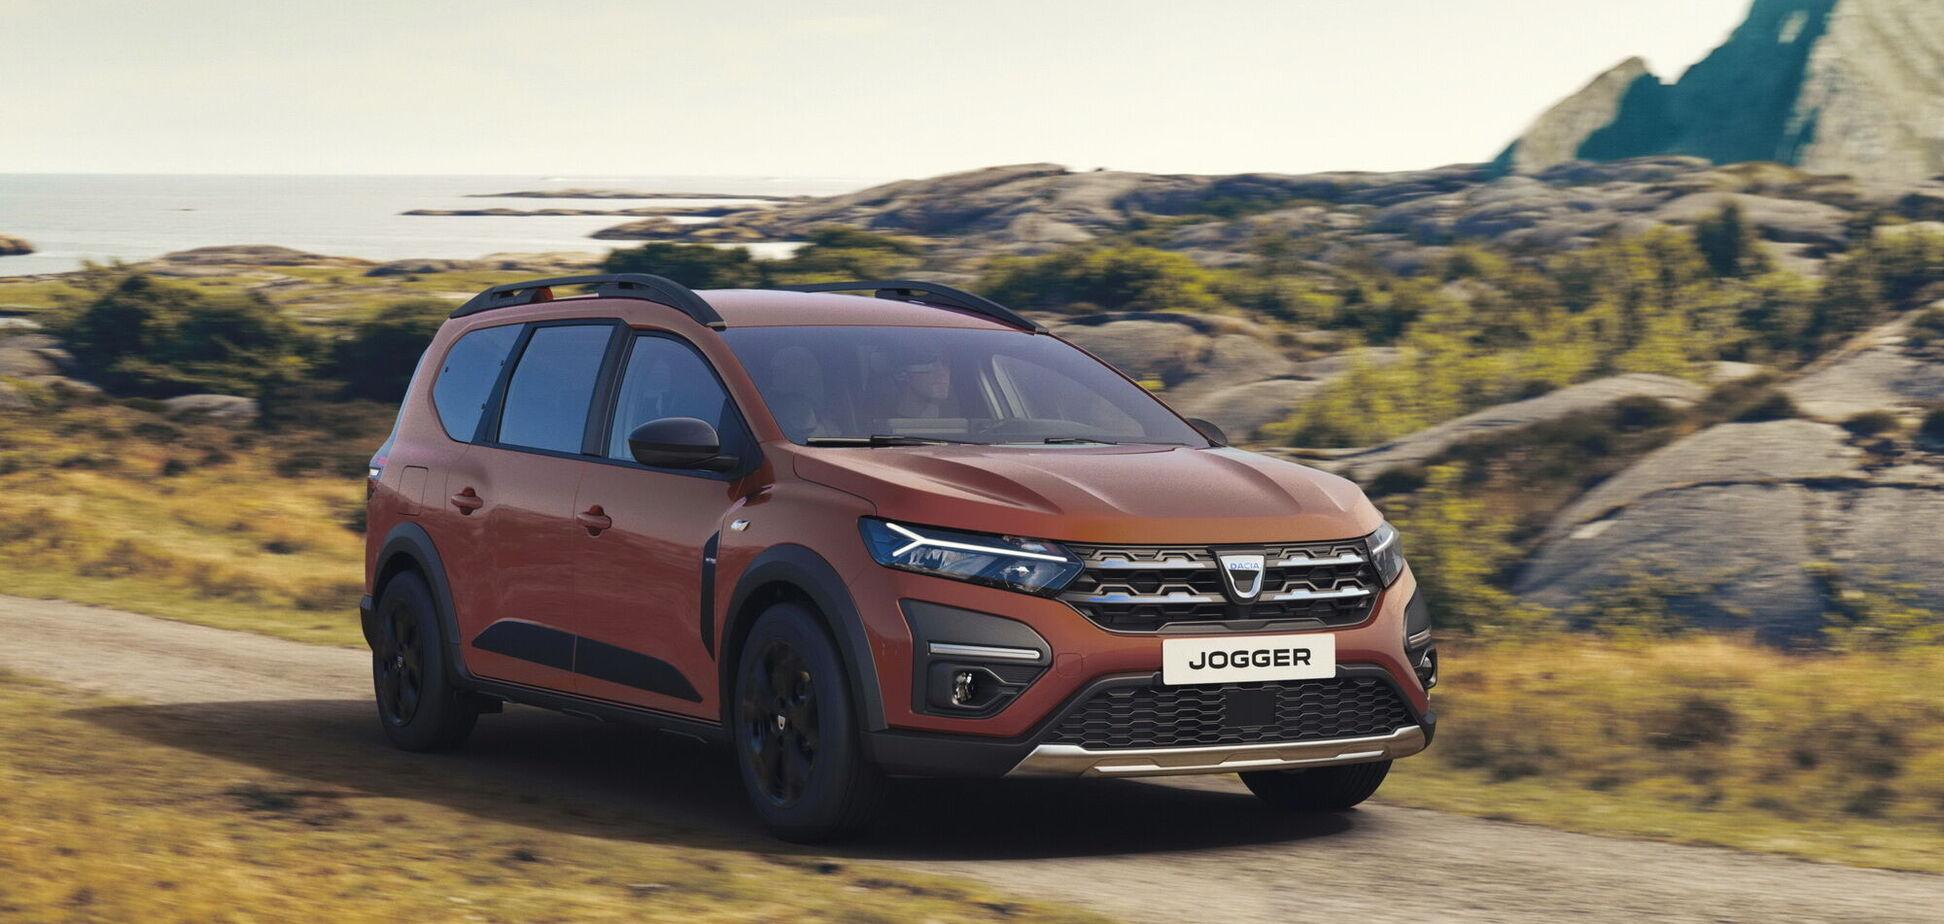 Renault презентовала универсал Jogger